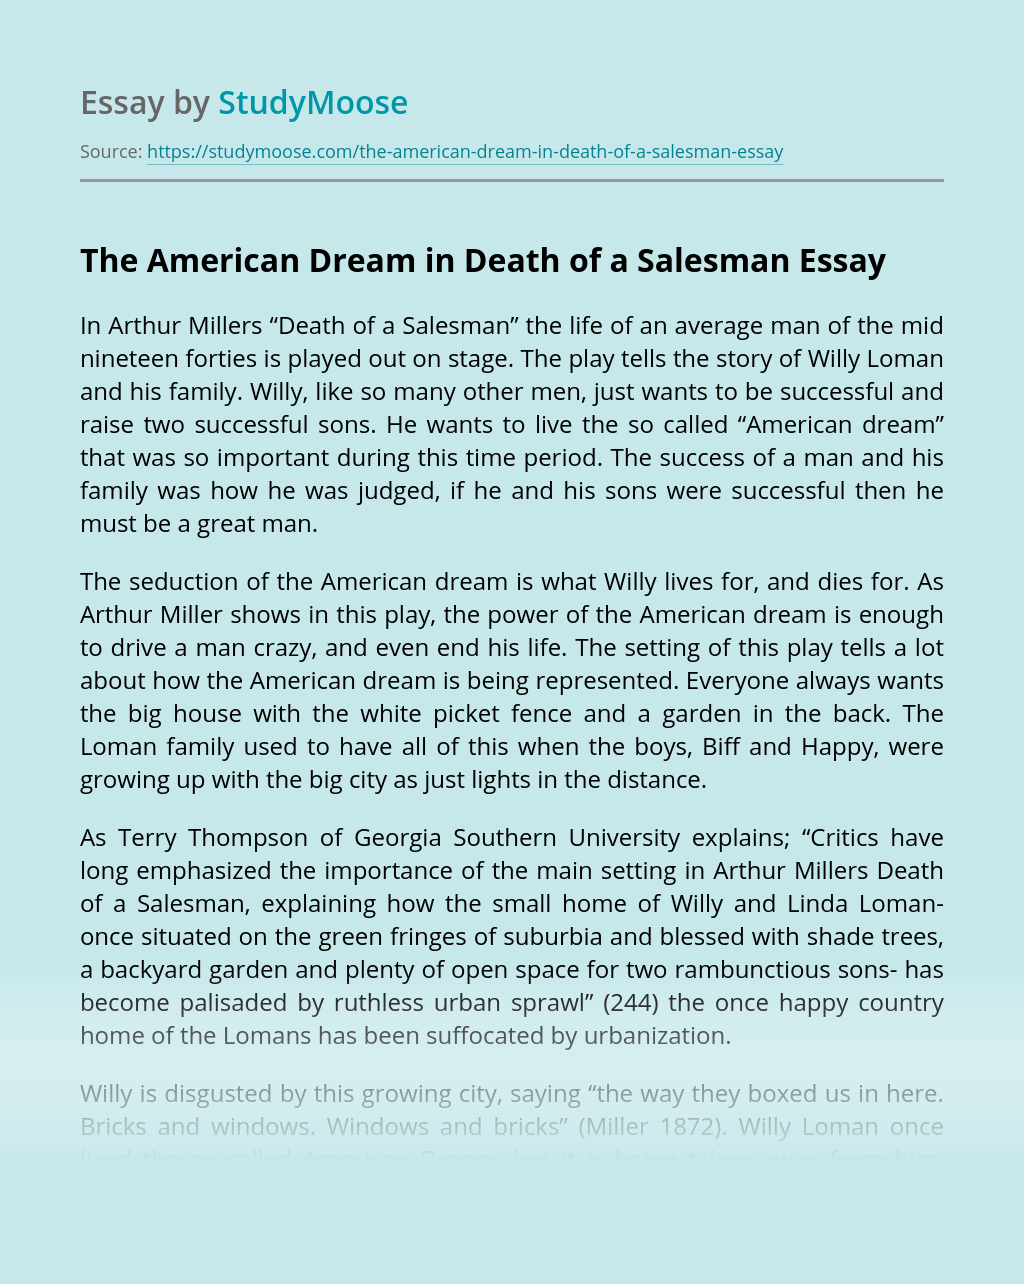 The American Dream in Death of a Salesman